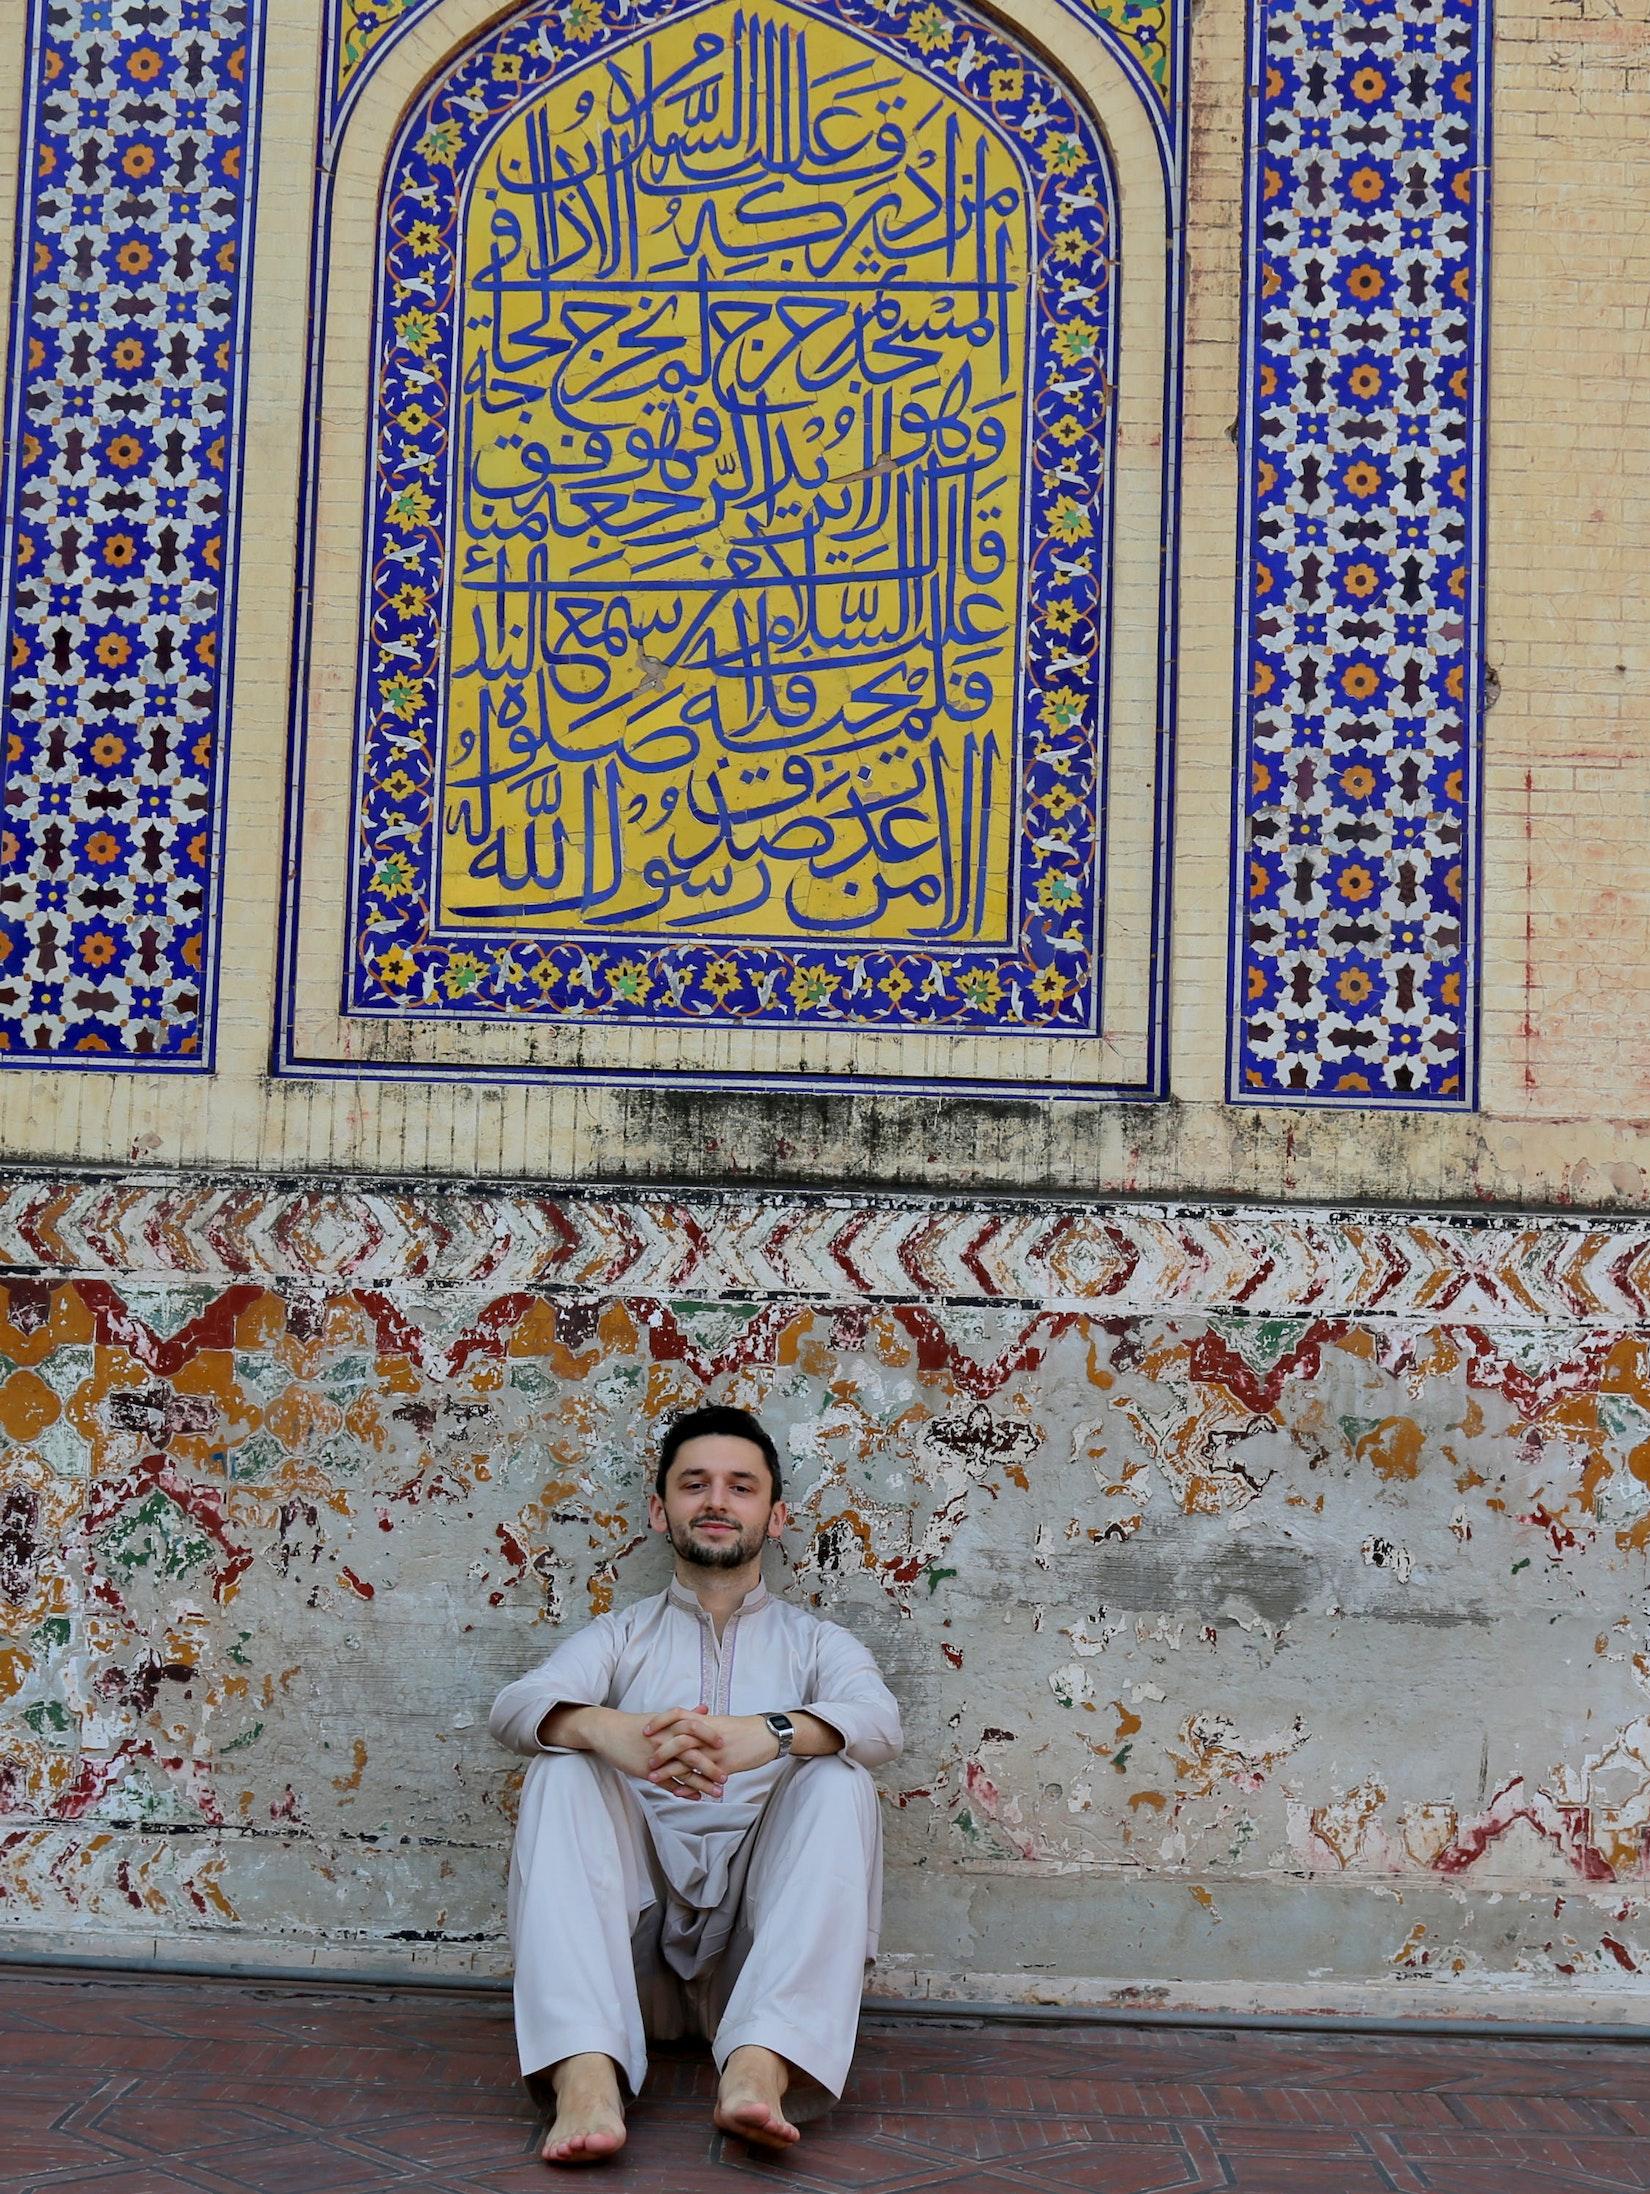 Daniel during his travels in Lahore, Pakistan